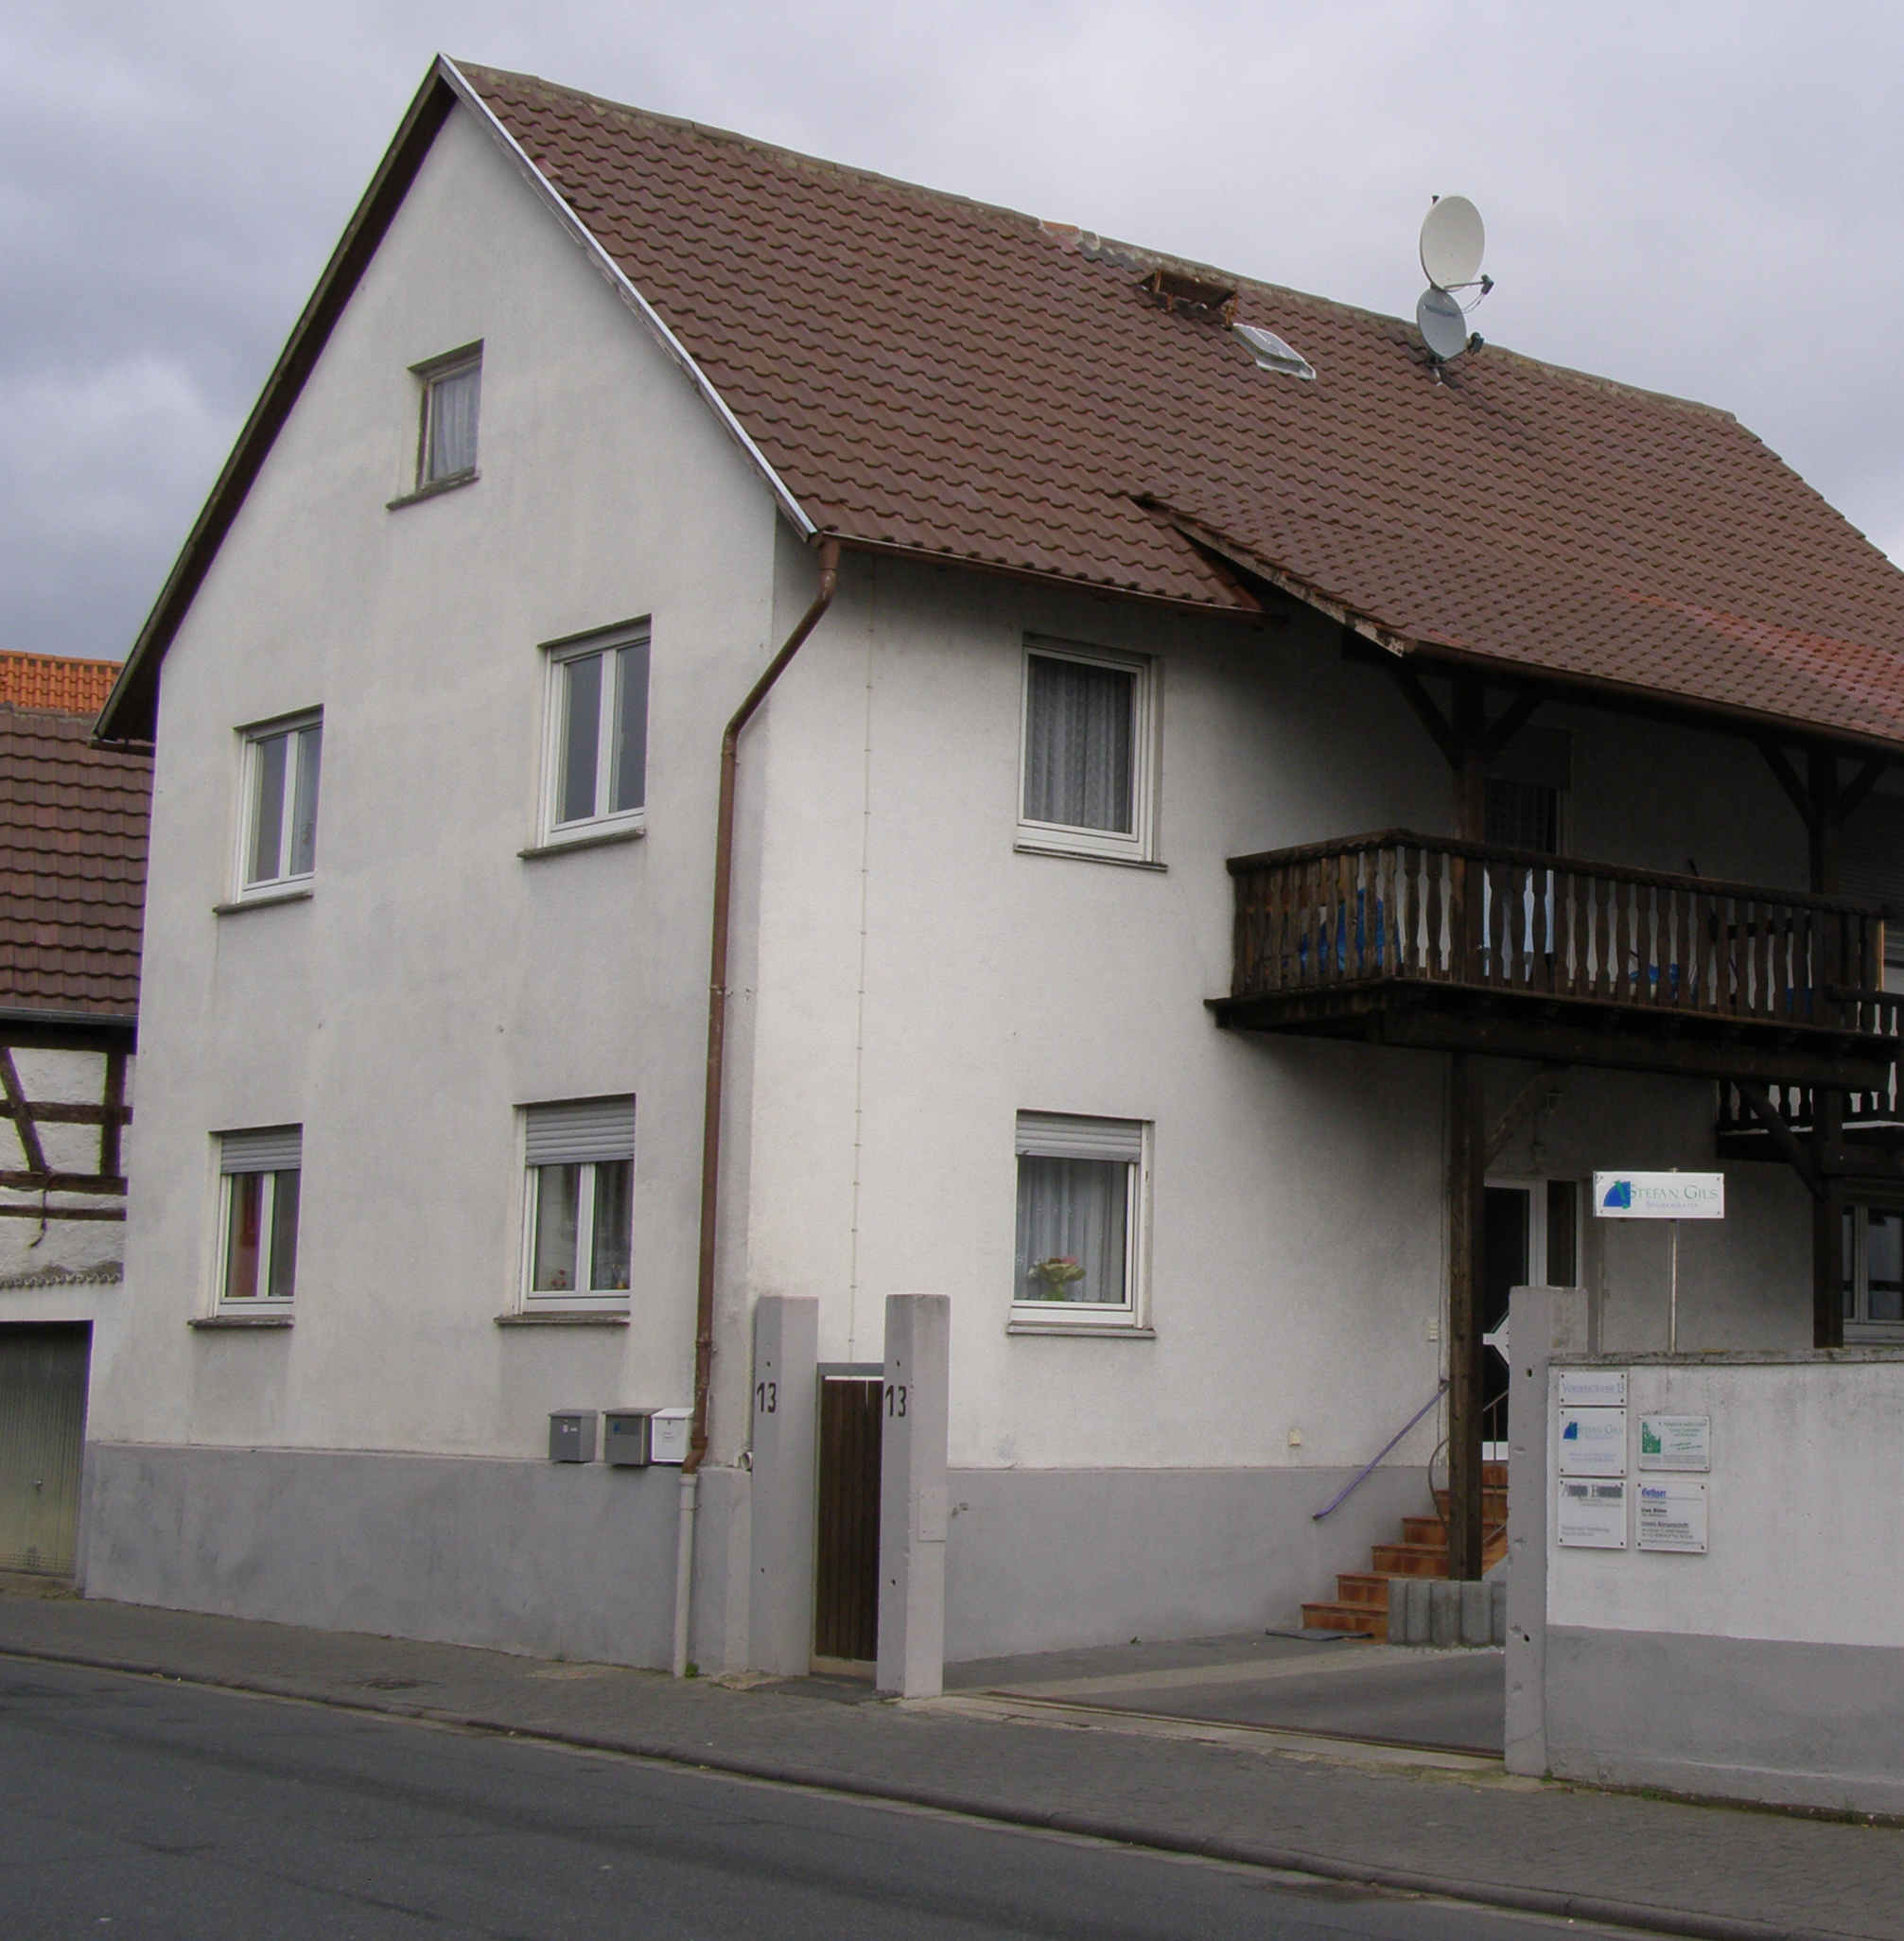 Stockstadt_GeburtshausWilhelm